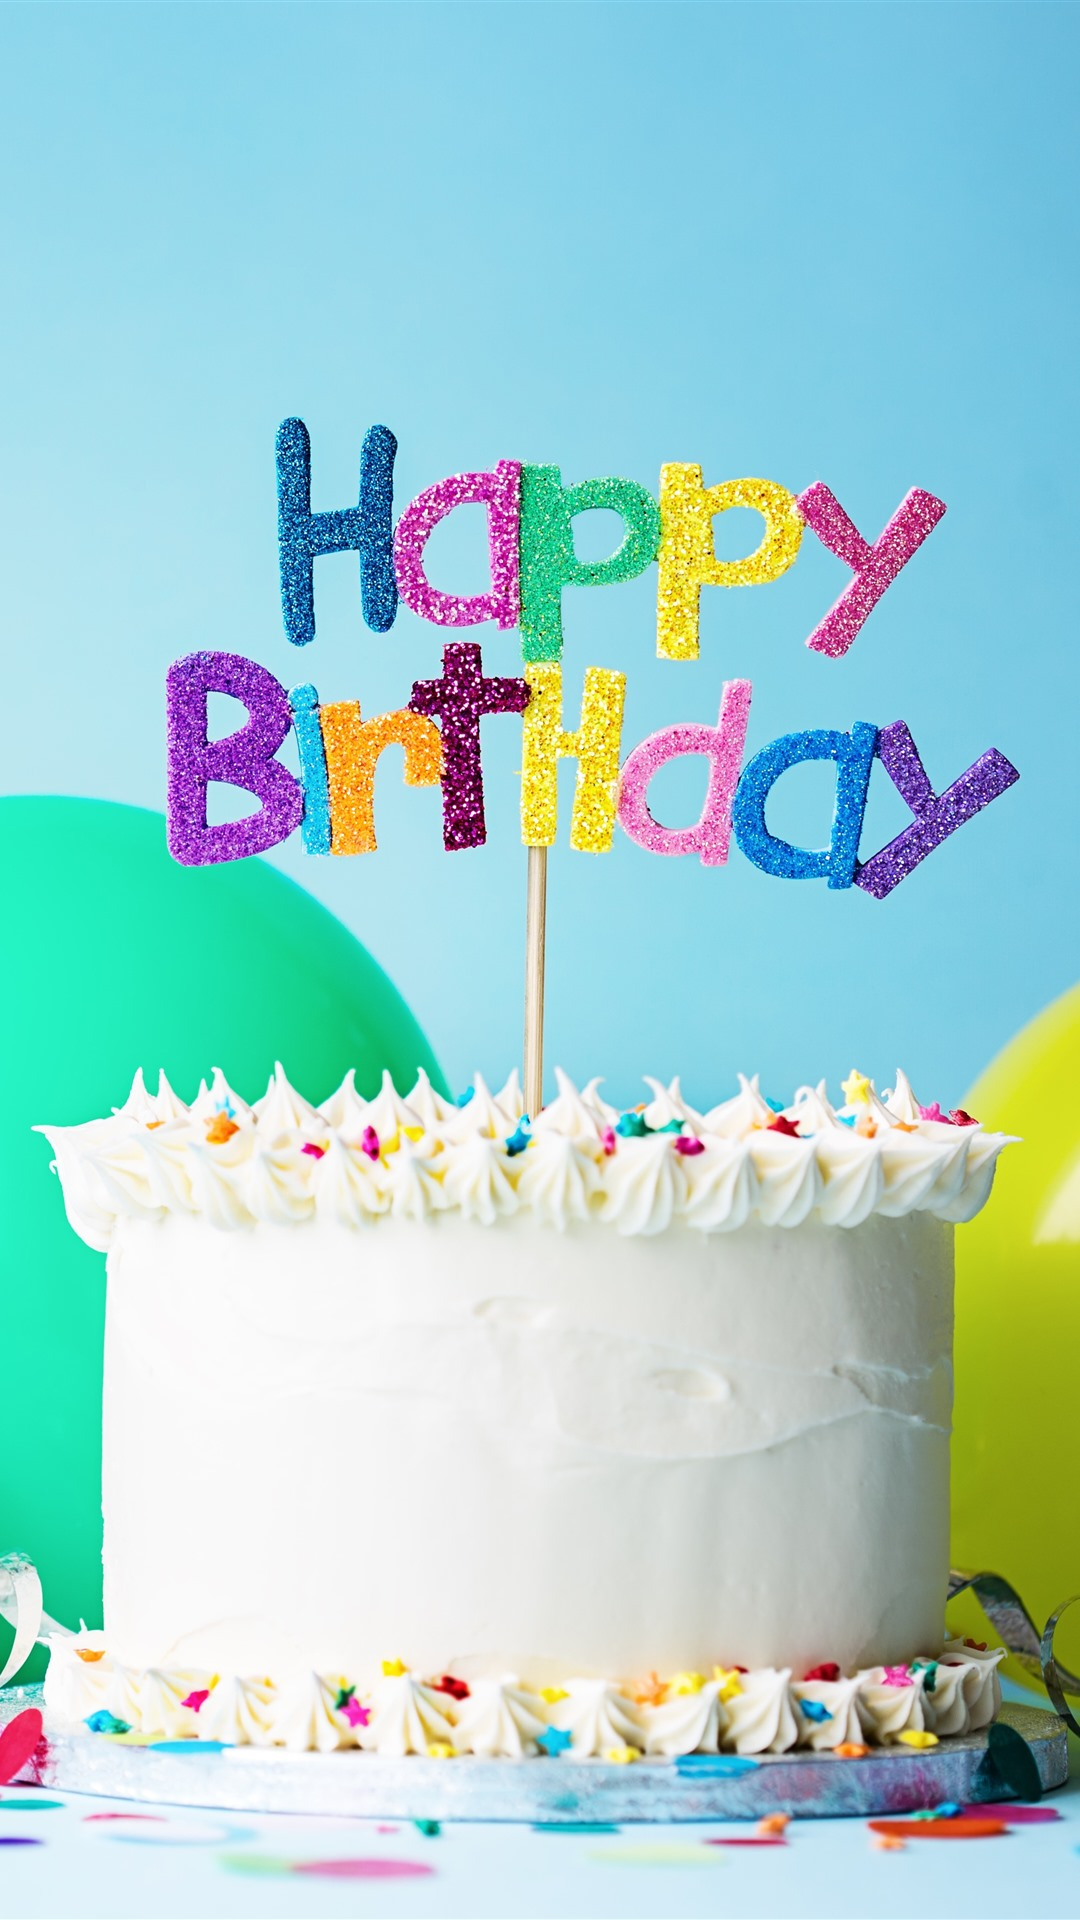 Sensational Happy Birthday Cake Hat Balloon Ribbon 1242X2688 Iphone 11 Pro Funny Birthday Cards Online Inifofree Goldxyz